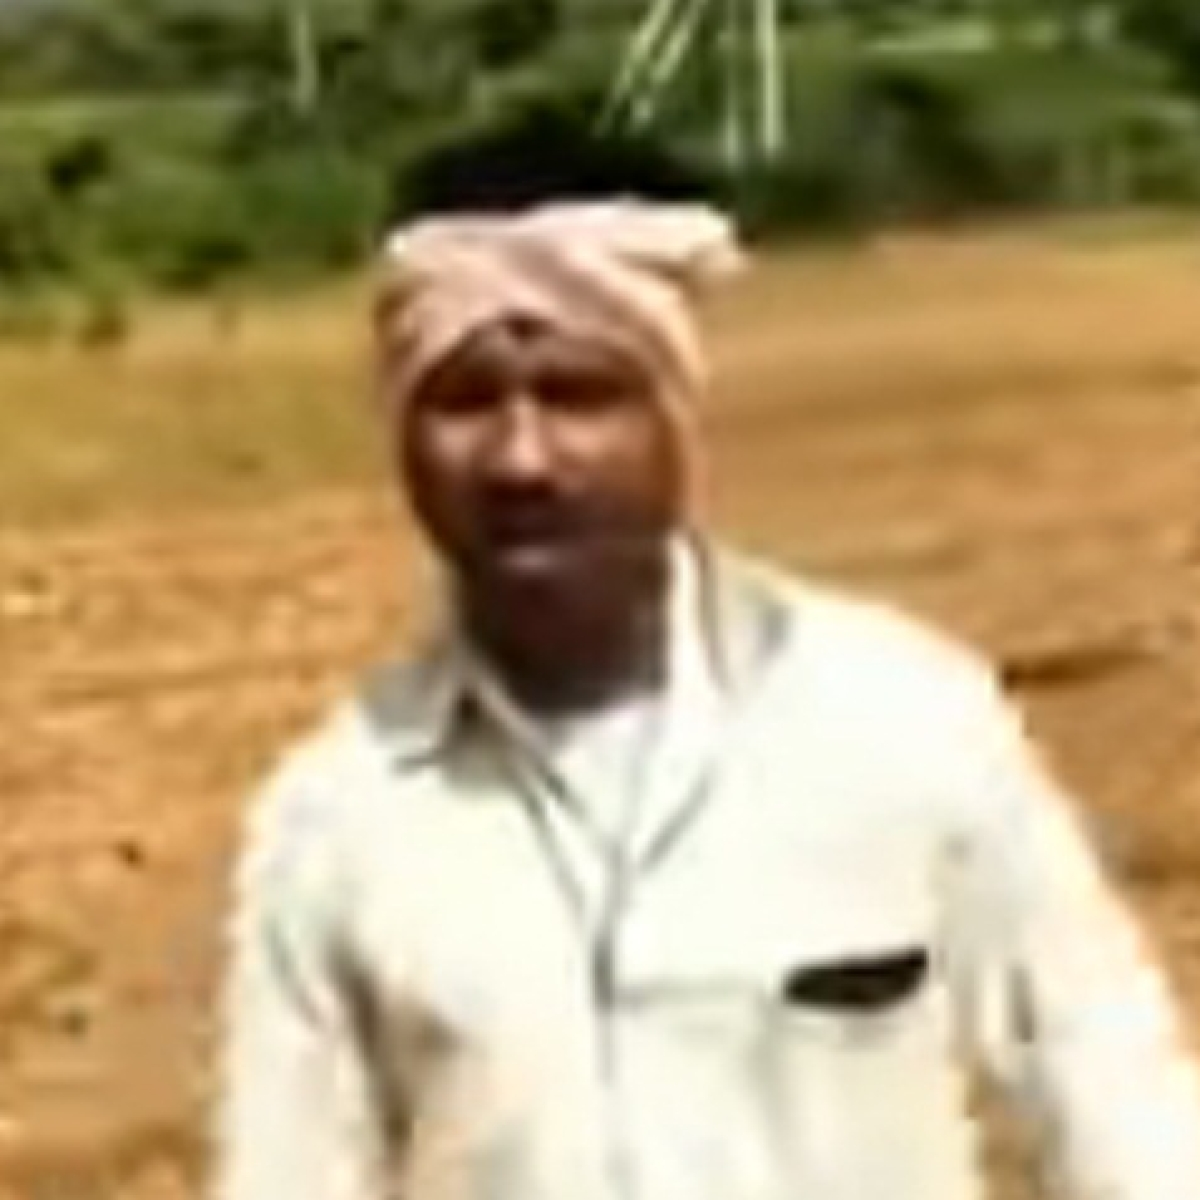 Indian Justin Bieber: Karnataka farmer performing 'Baby' will make your day